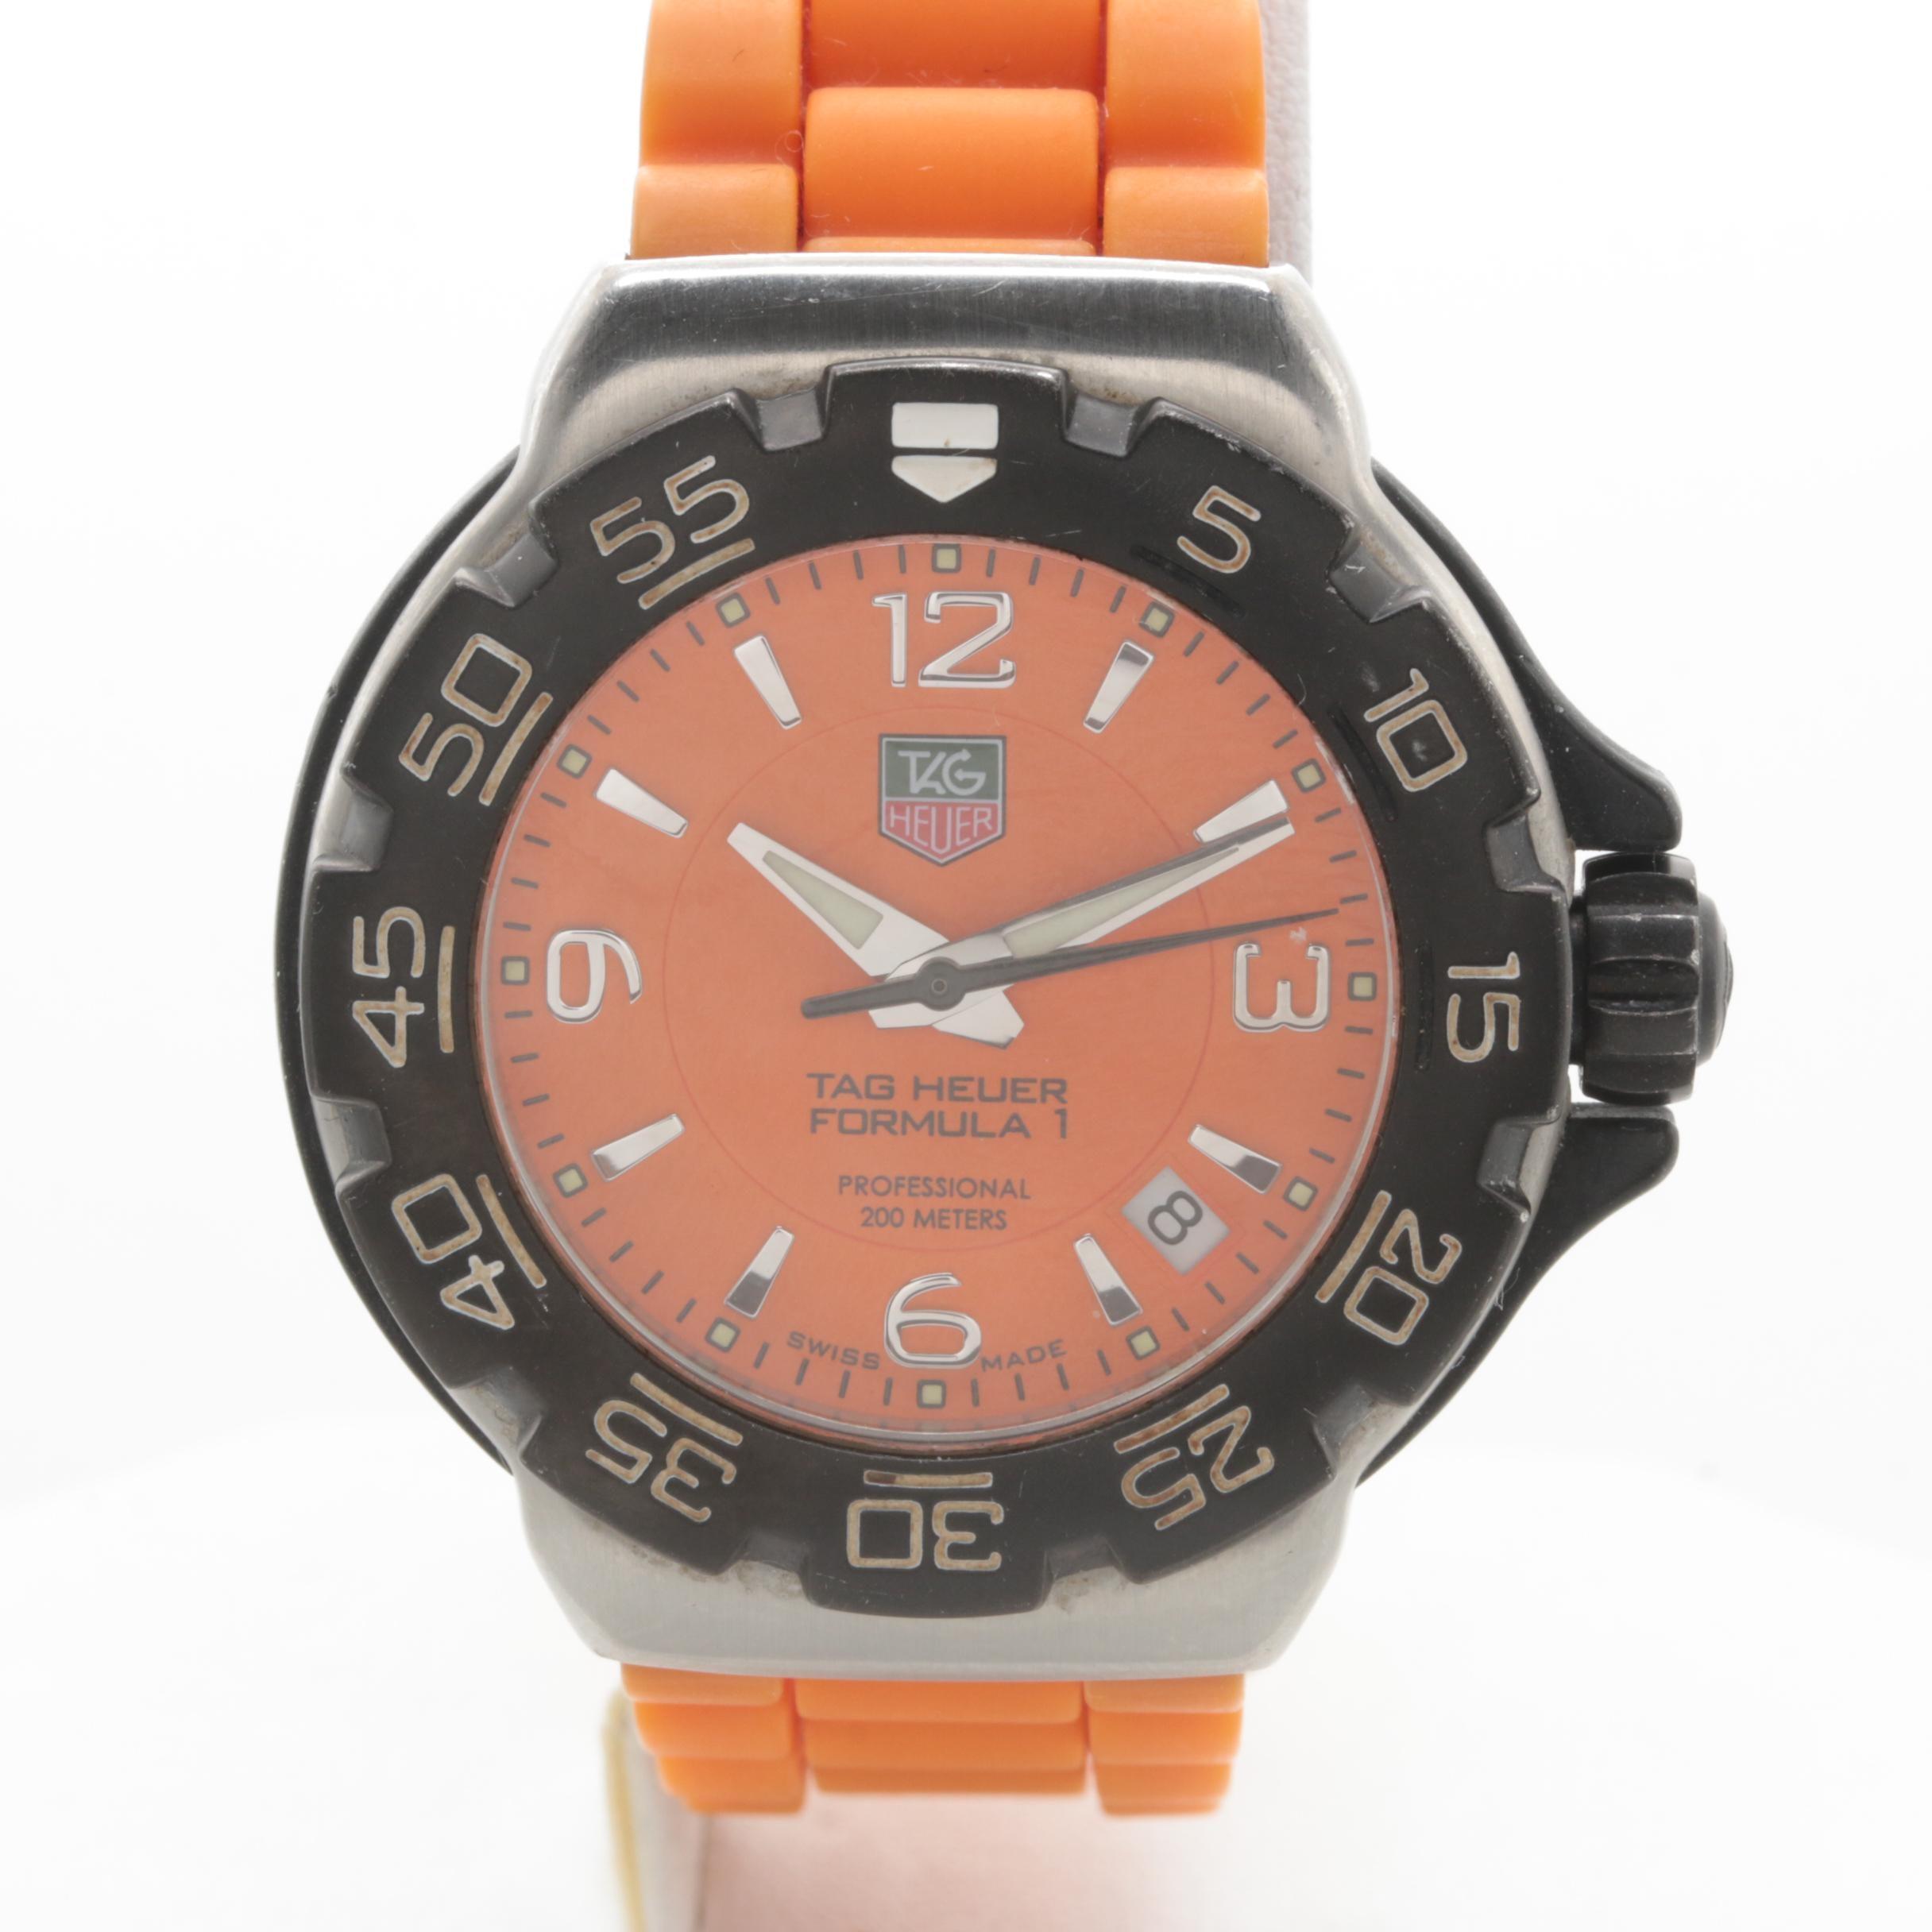 TAG Heuer Stainless Steel Orange Rubber Wristwatch